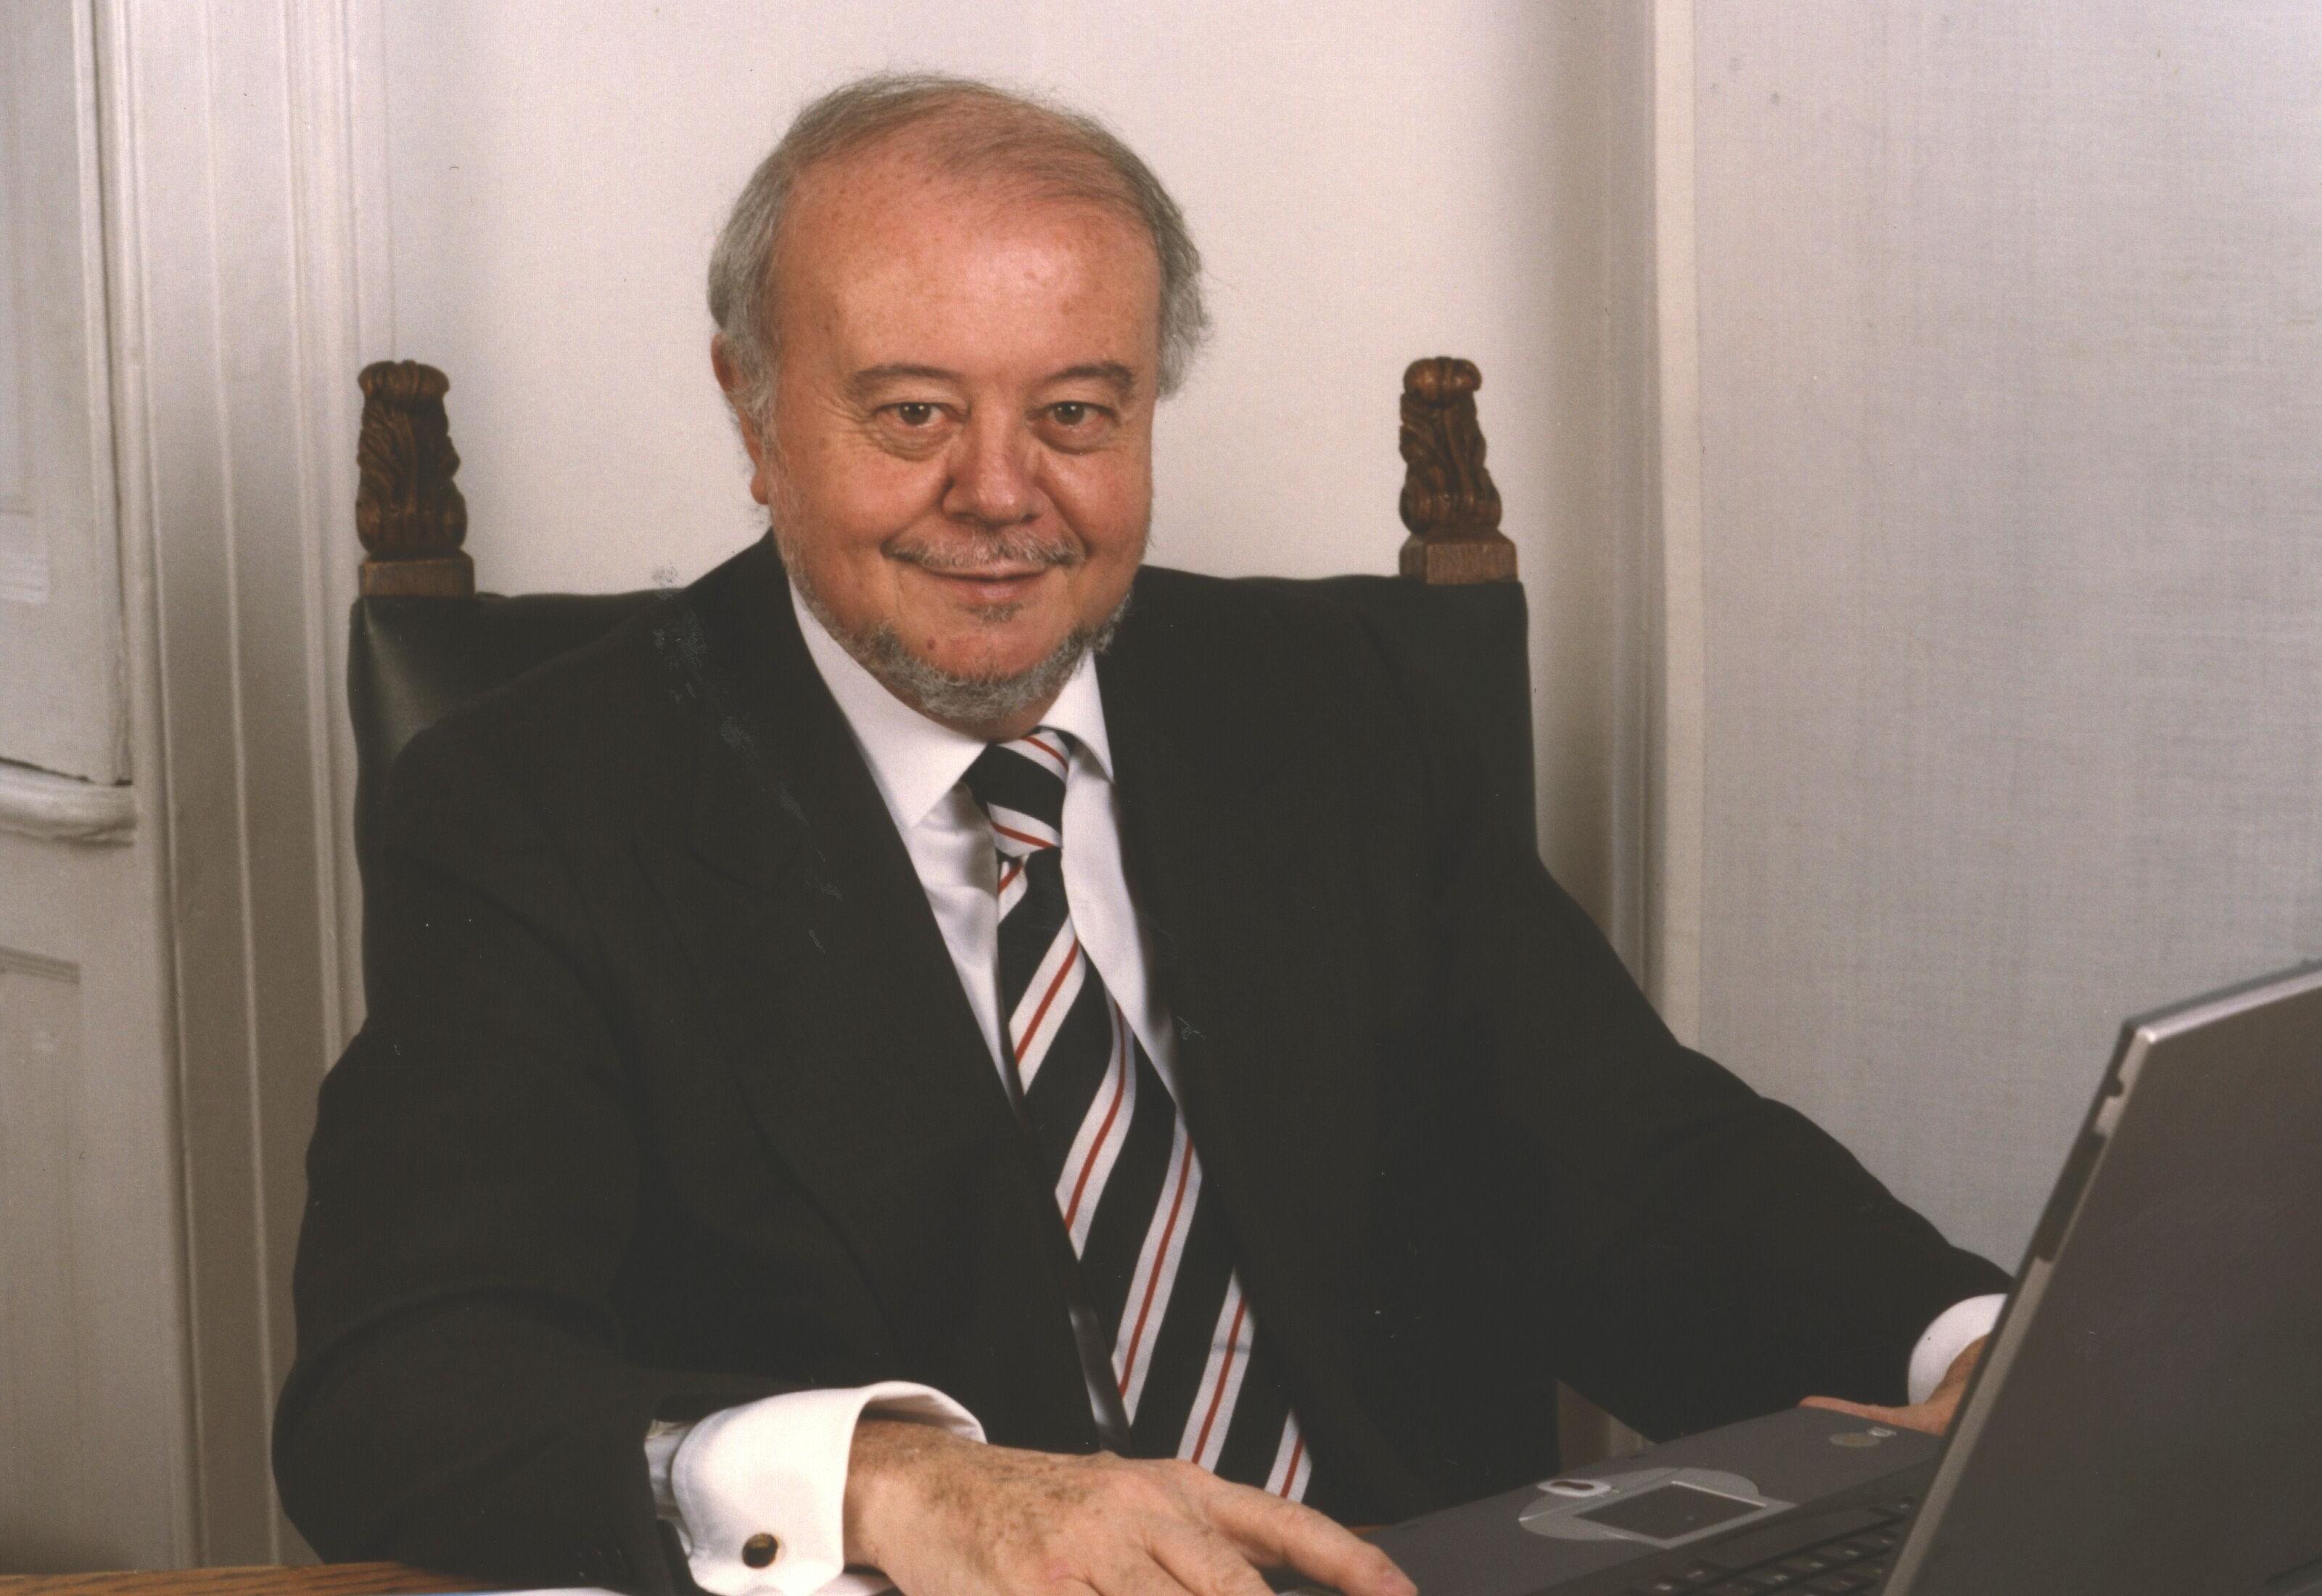 Gian Mario Baccalini, Aschimfarma's president